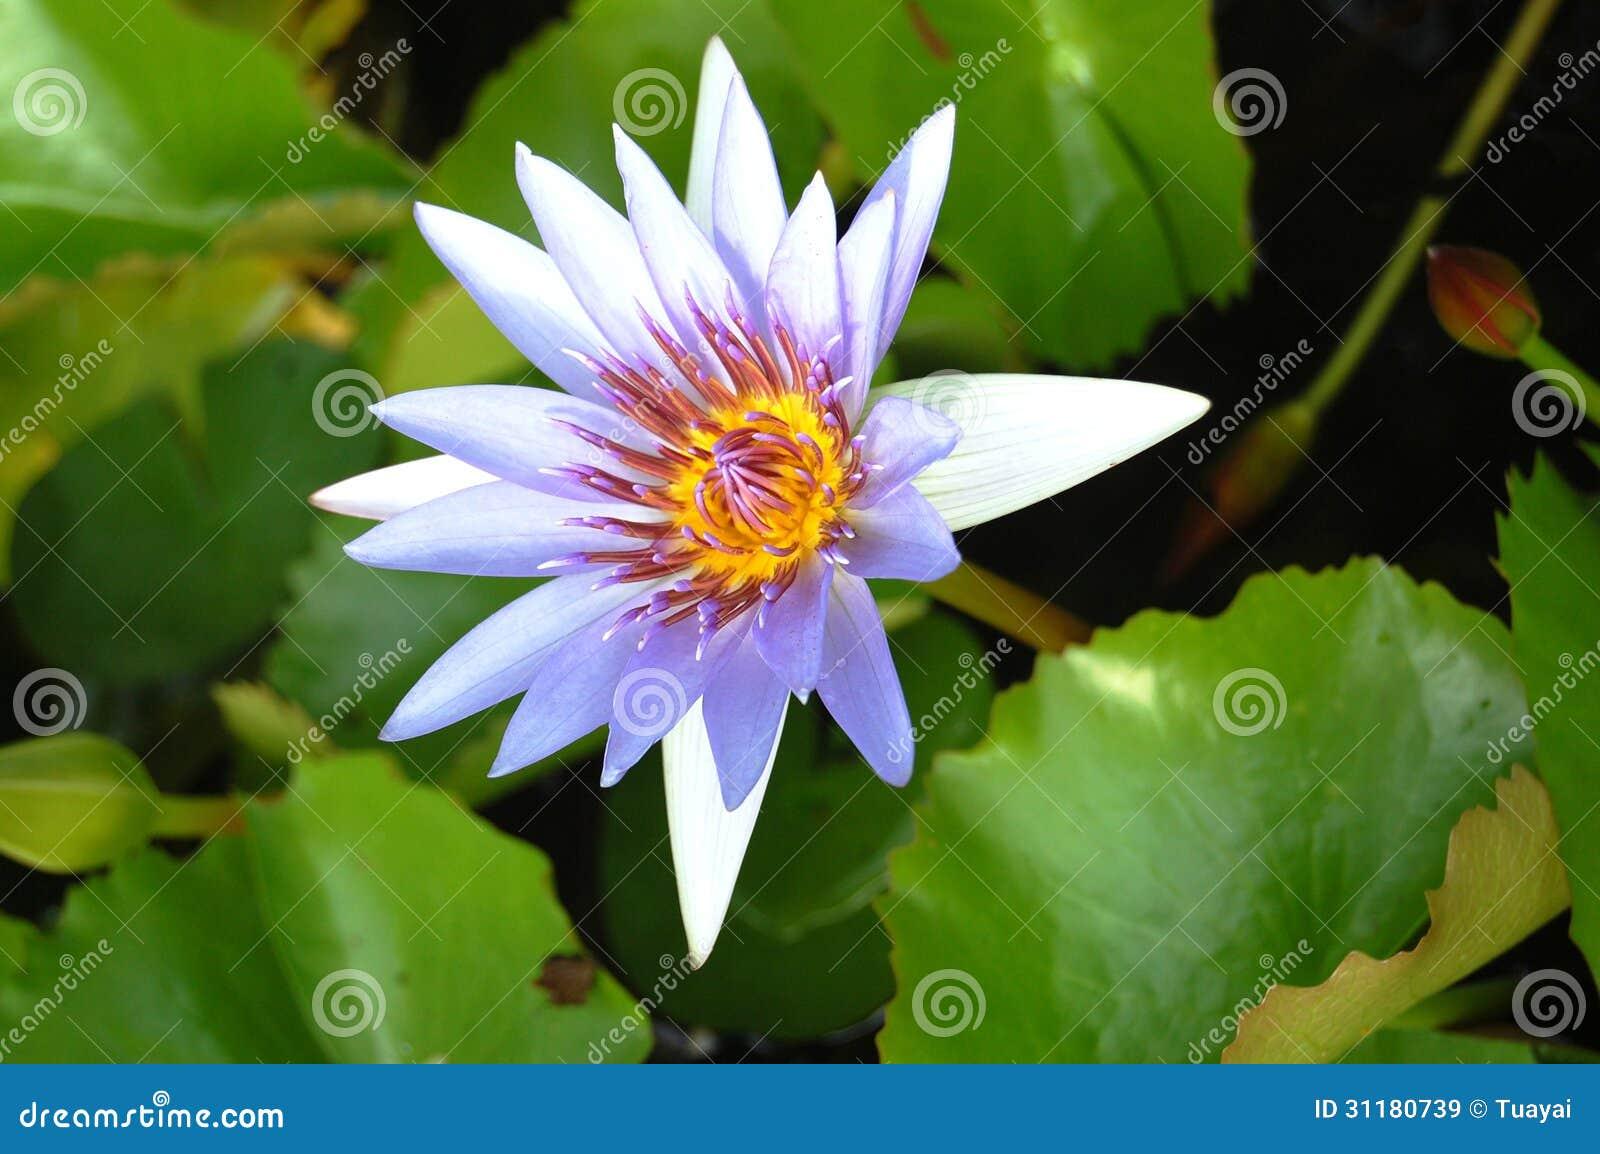 violet lotus blossom lizenzfreie stockbilder bild 31180739. Black Bedroom Furniture Sets. Home Design Ideas